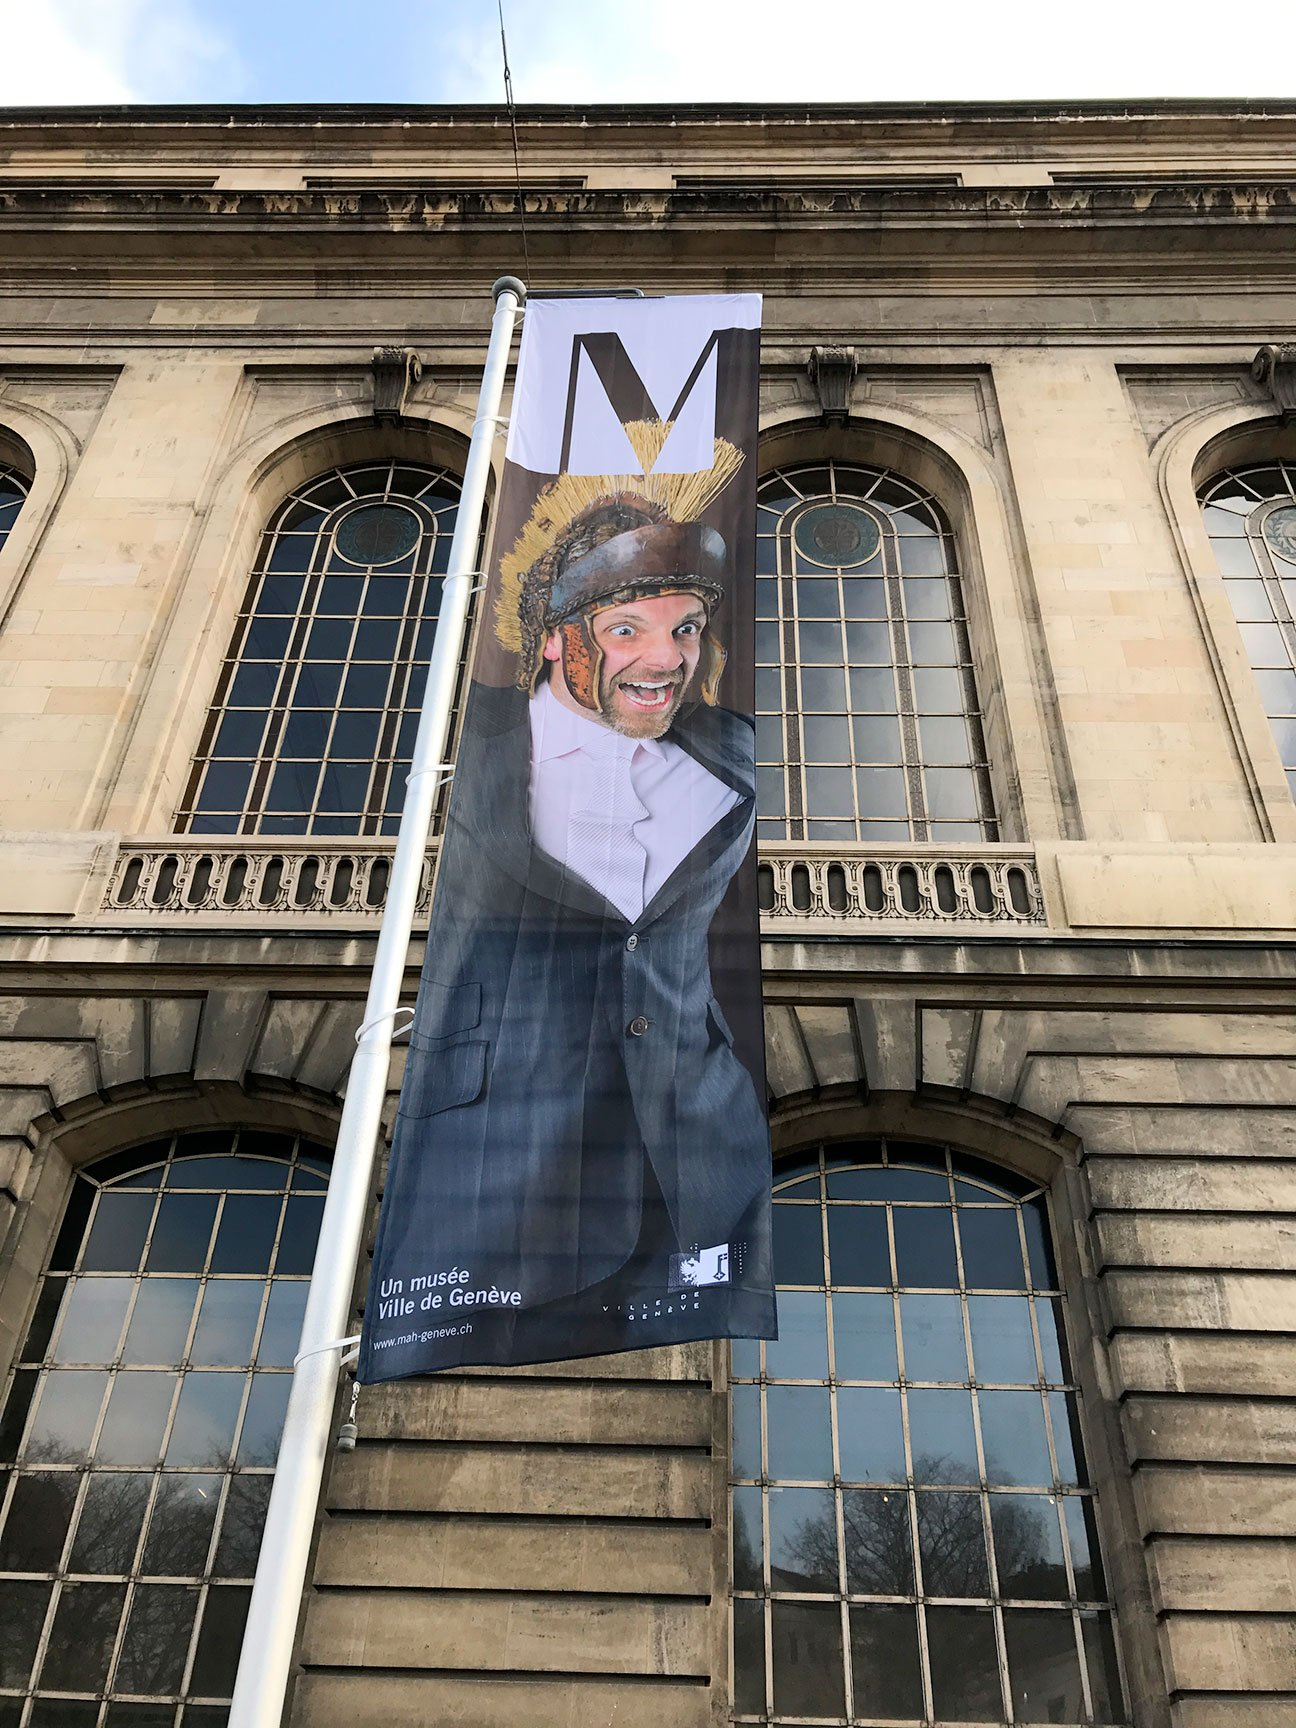 Fabien_cuffel_Musee-art-et-histoire-geneve_campagne-institutionnelle-drapeaux_Charly